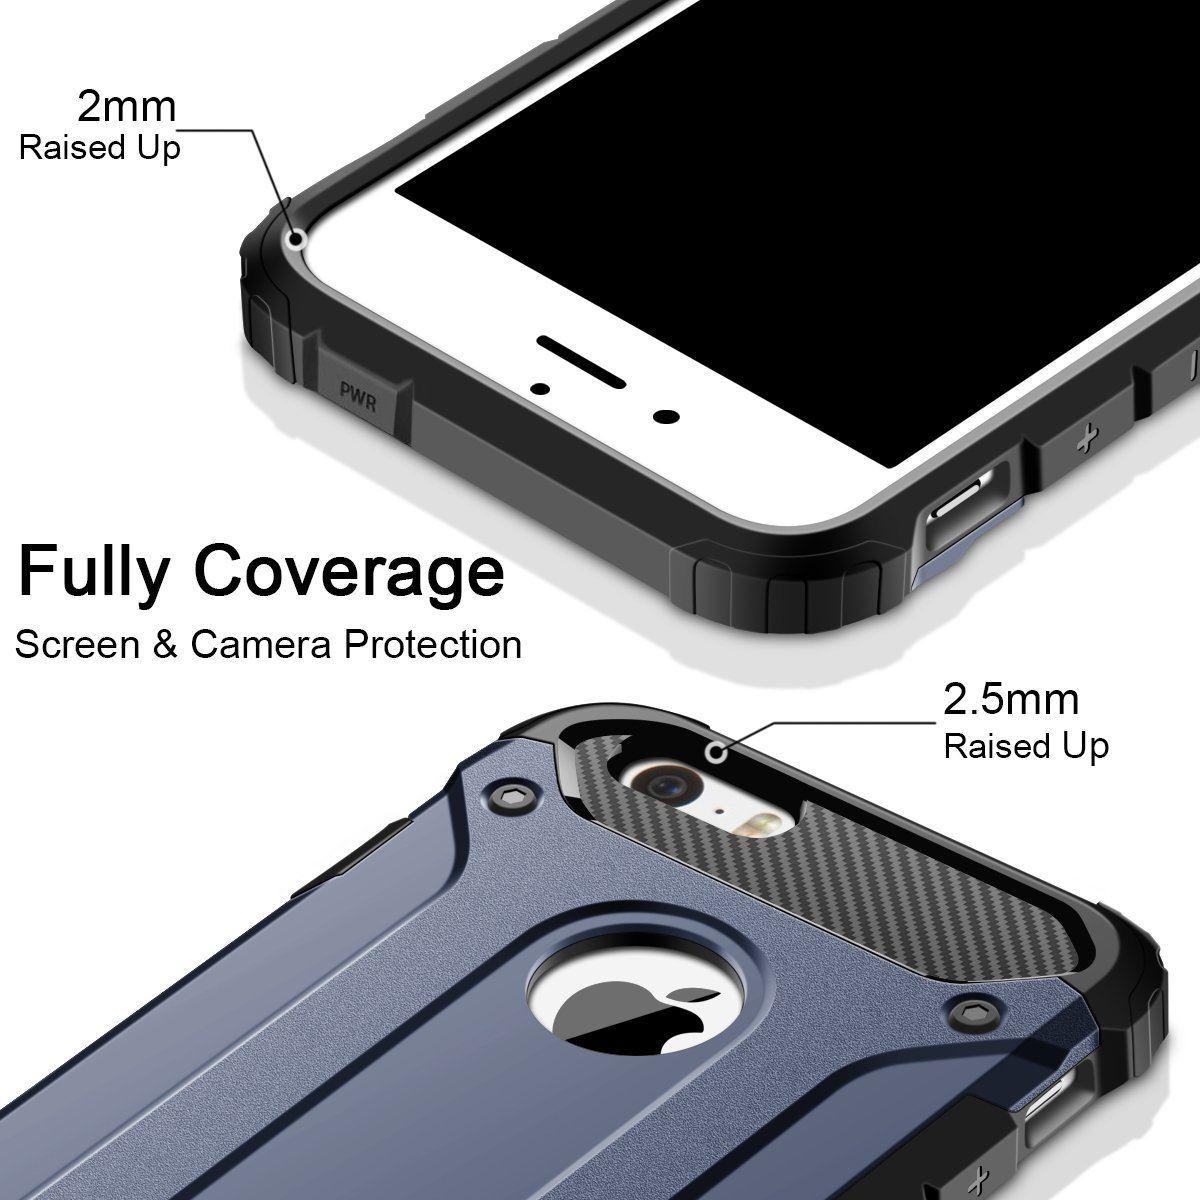 thumbnail 22 - For Apple iPhone 11 Pro Max XR Xs X 8 7 Plus 6 5 Se Case Cover Tough Armor